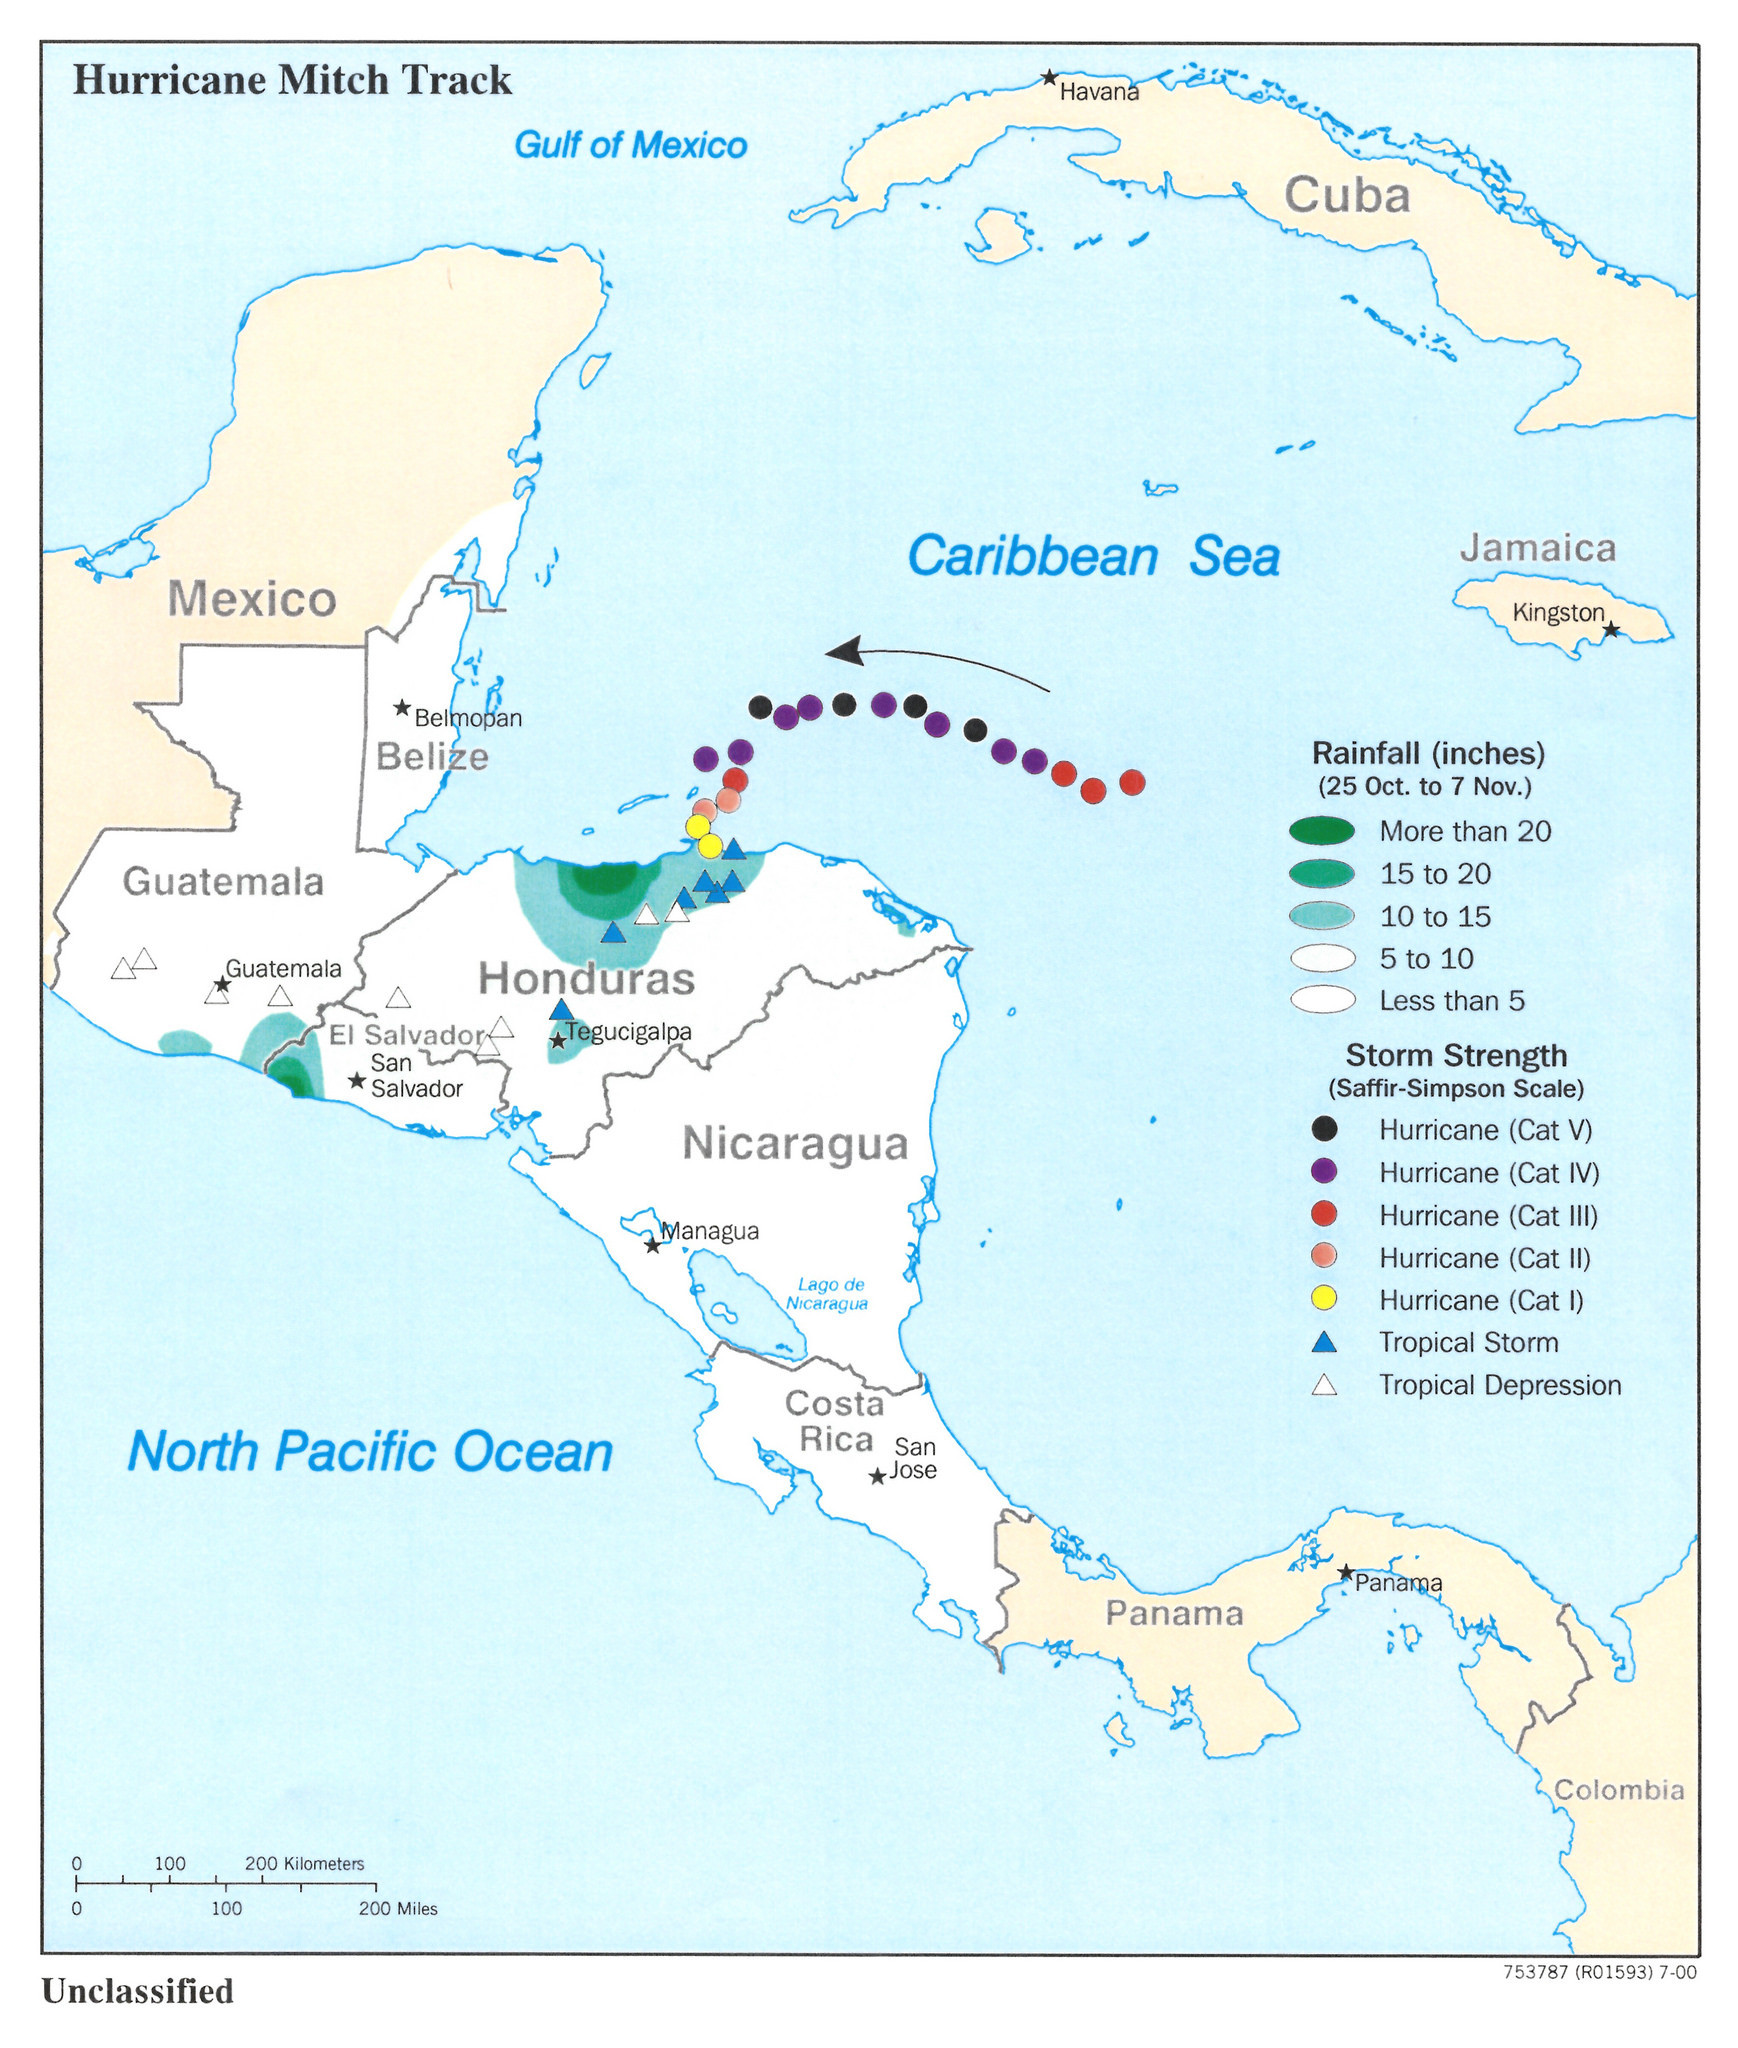 Path of Hurricane Mitch